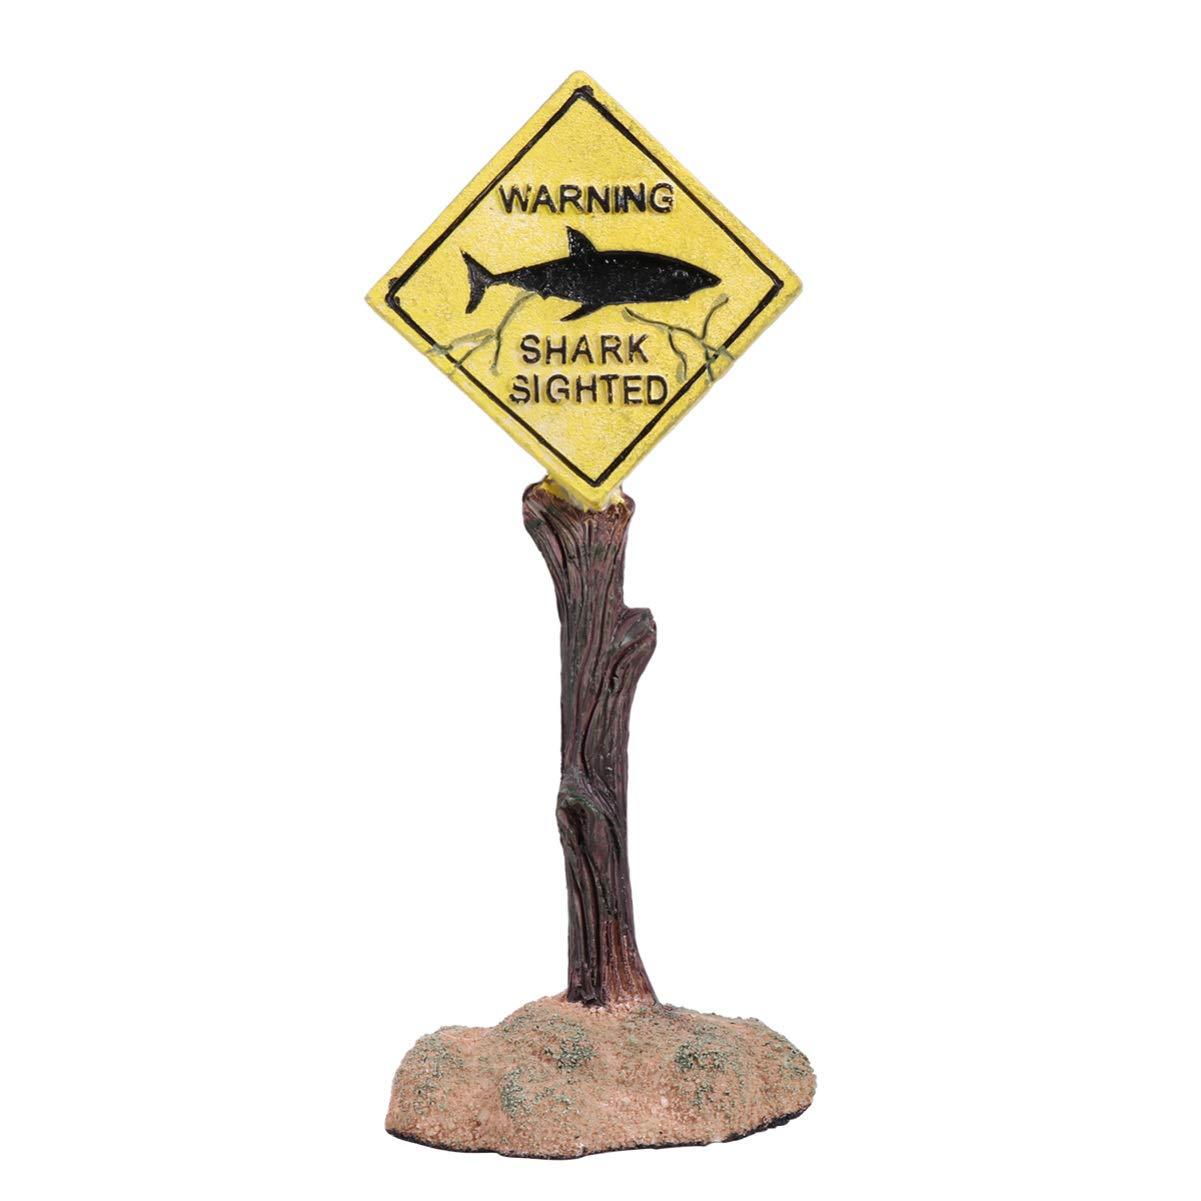 Balacoo Aquarium Funny Ornaments Shark Warning Signs Fish Tank Resin Decoration Craft Landscape DÃcor for Aquarium Fish Tank Home